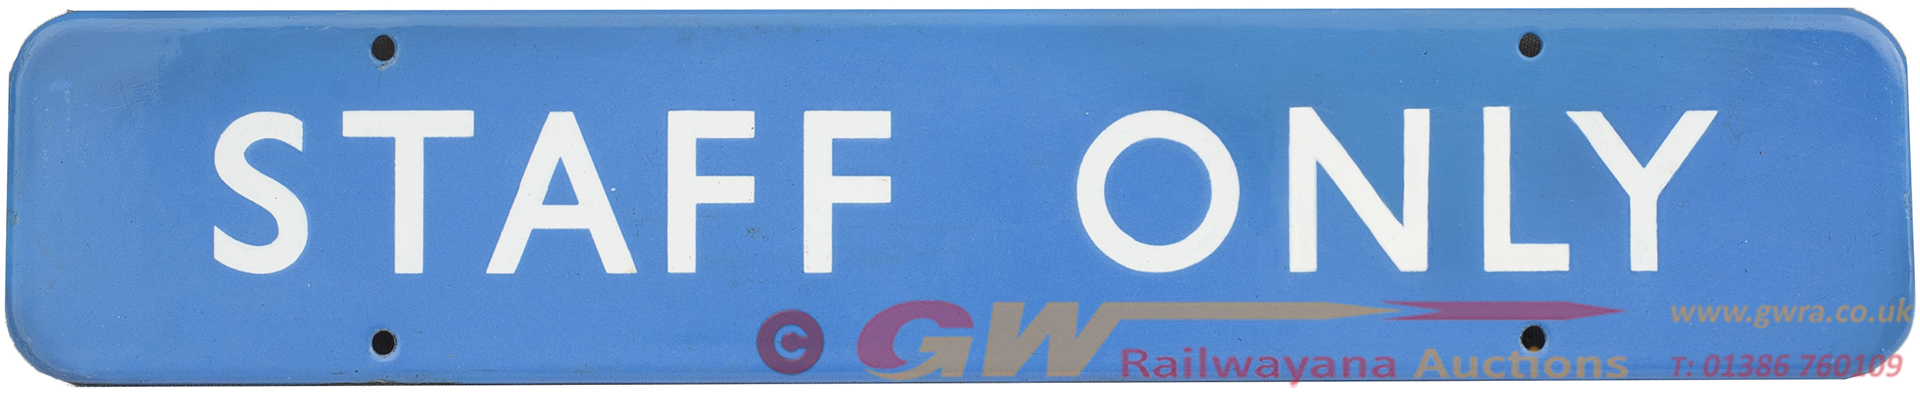 BR(SC) FF Enamel Doorplate STAFF ONLY Measuring